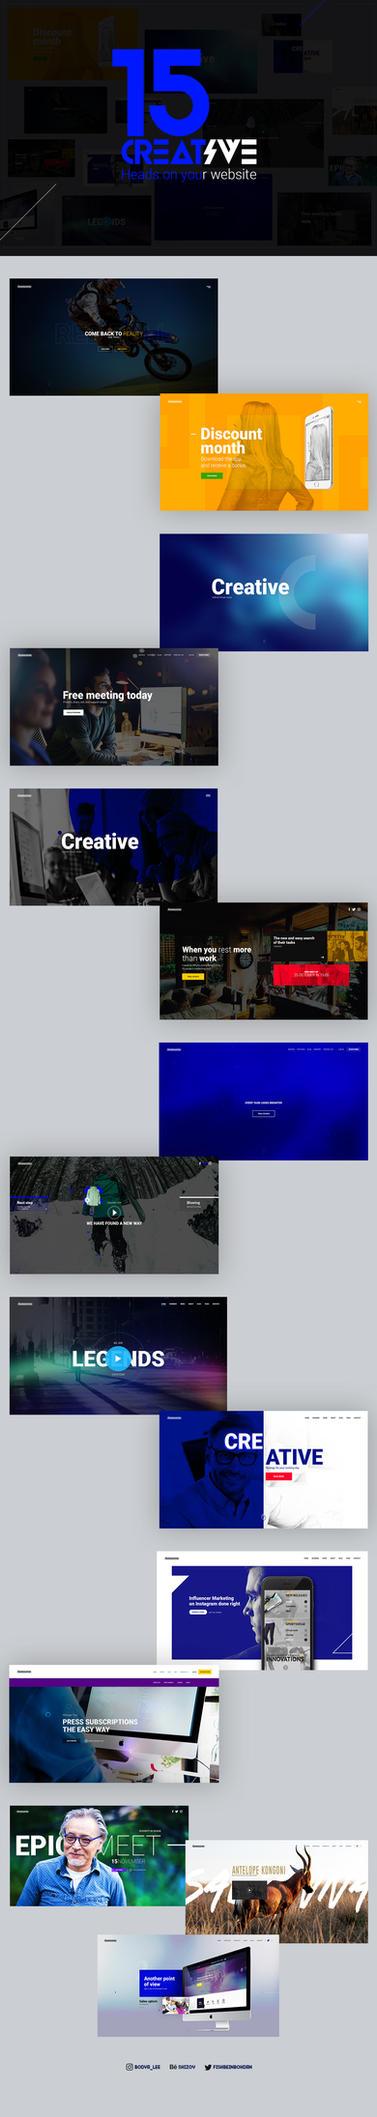 15 Creative Head on your Website by Shizoy